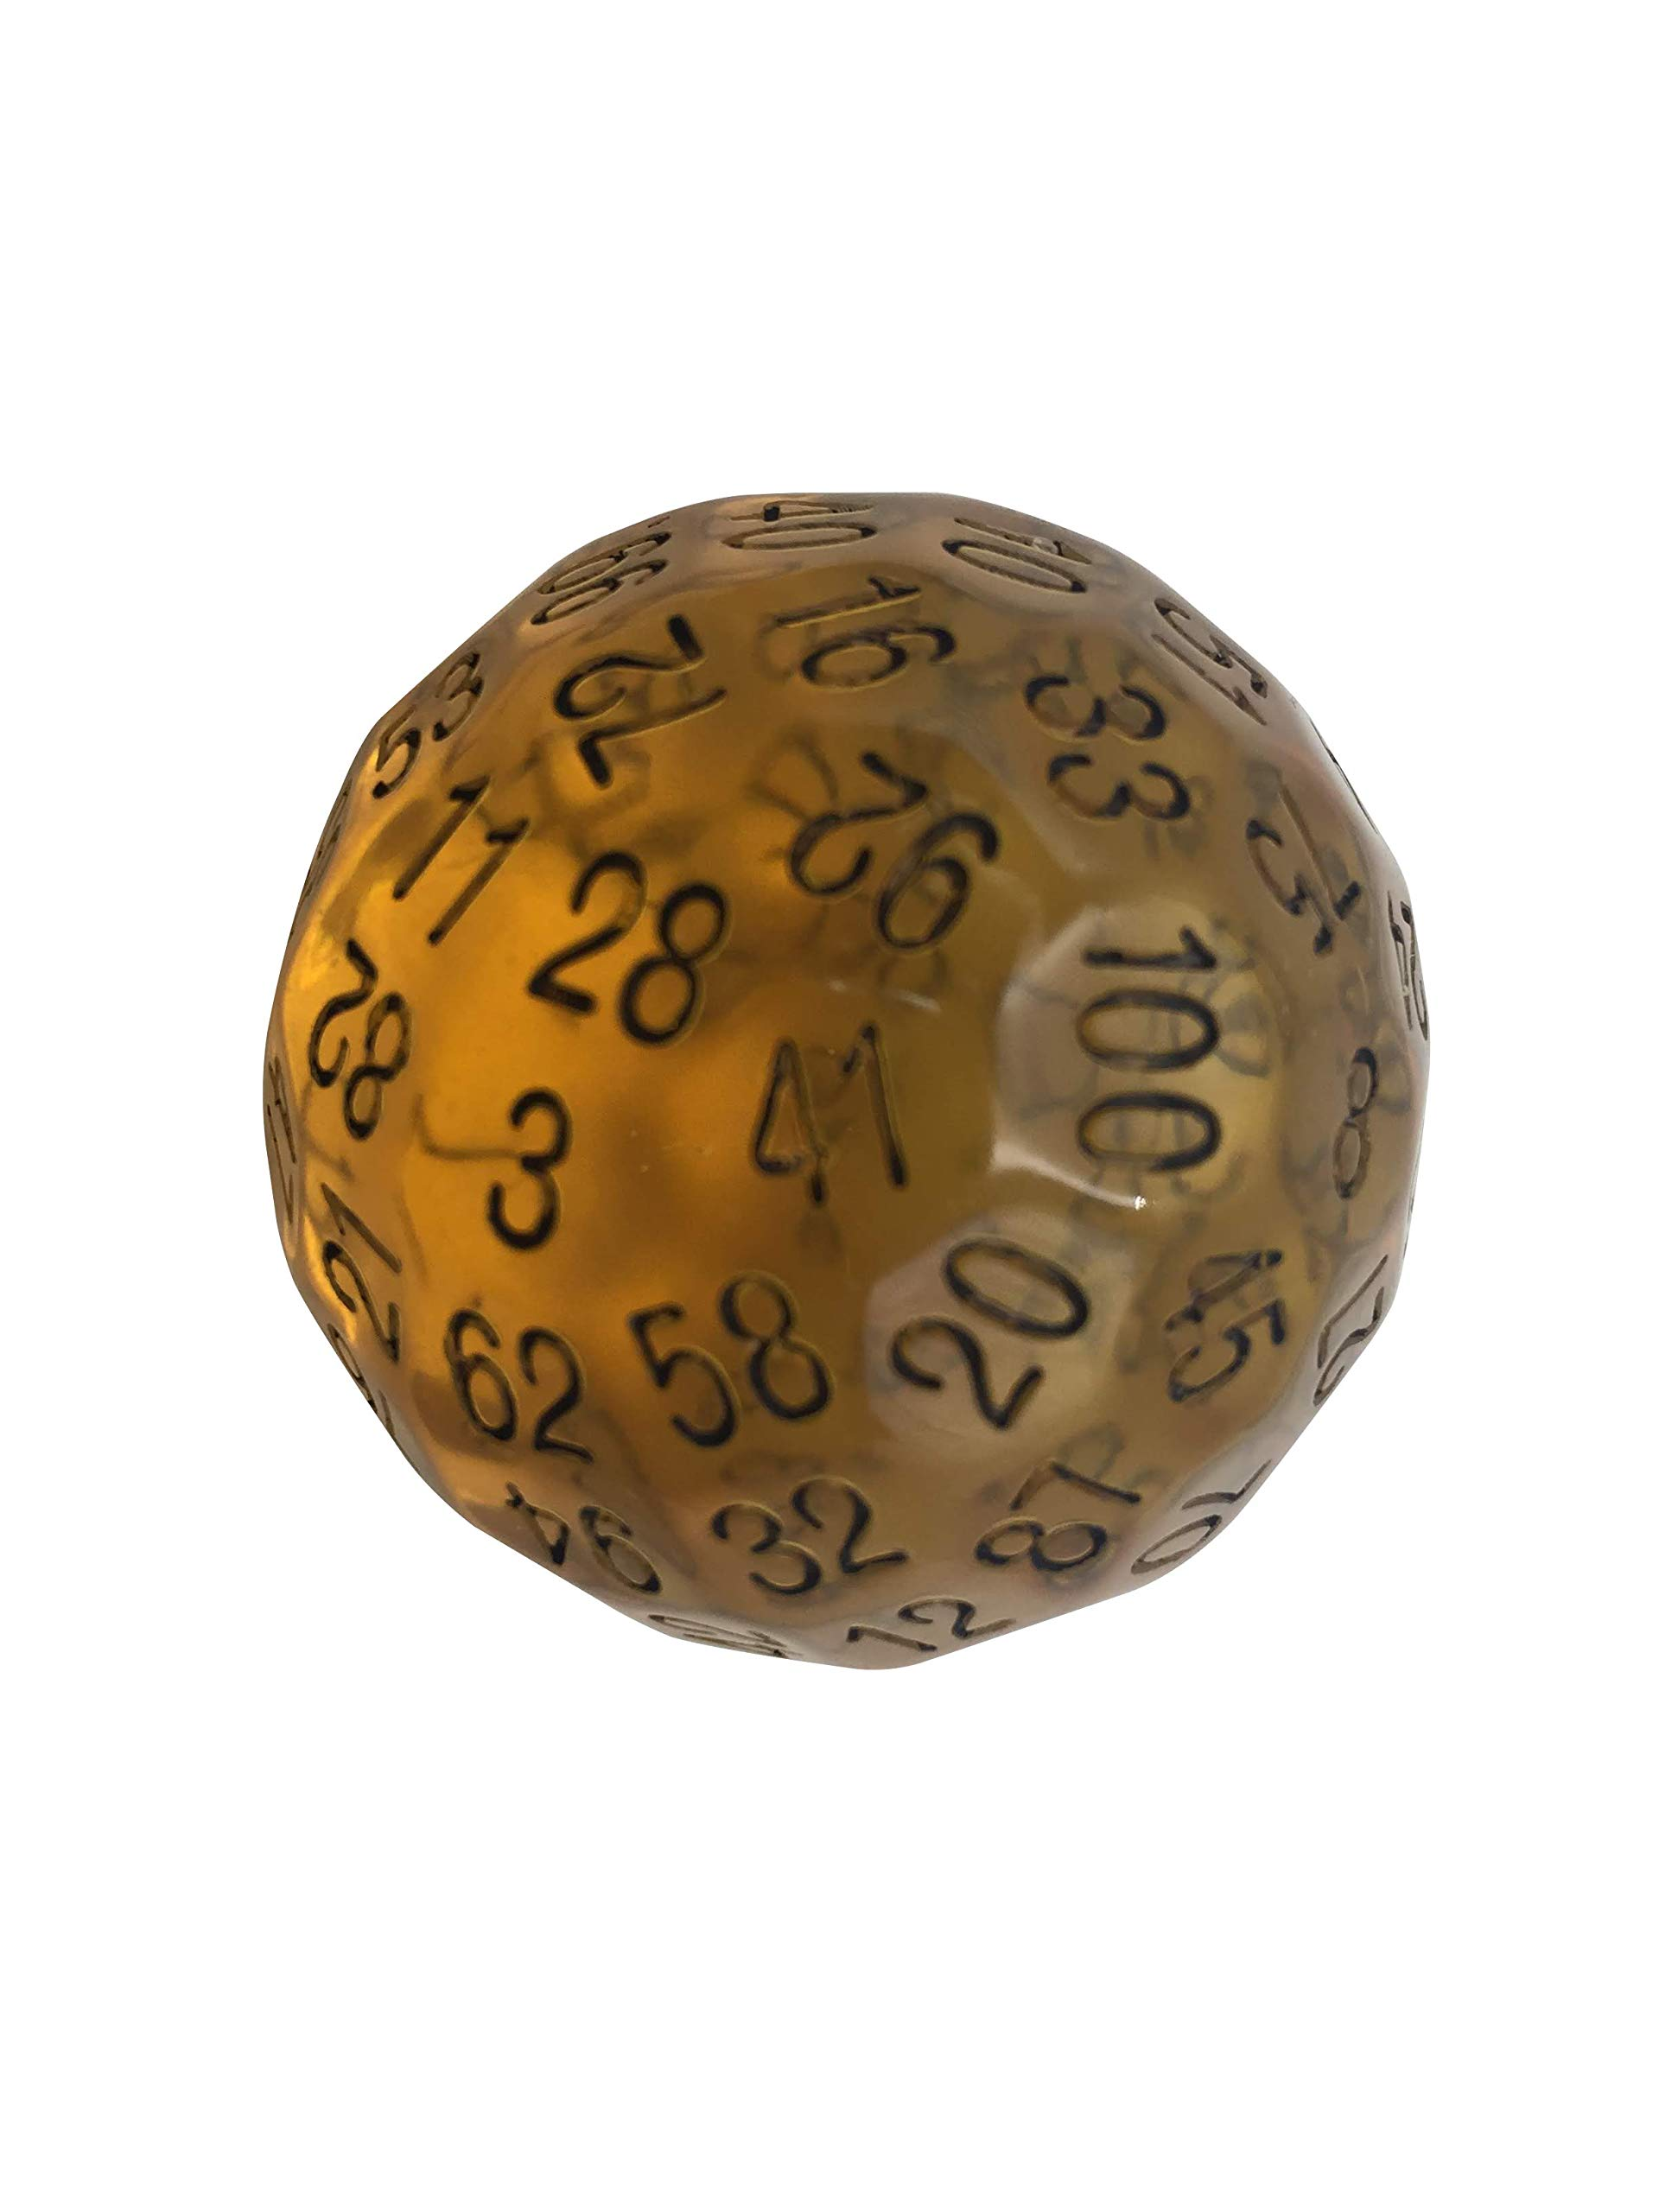 Skull Splitter Dice Single 100 Sided Polyhedral Dice (D100) | Translucent Amber Color Die for RPGs (45mm) by SkullSplitter Dice